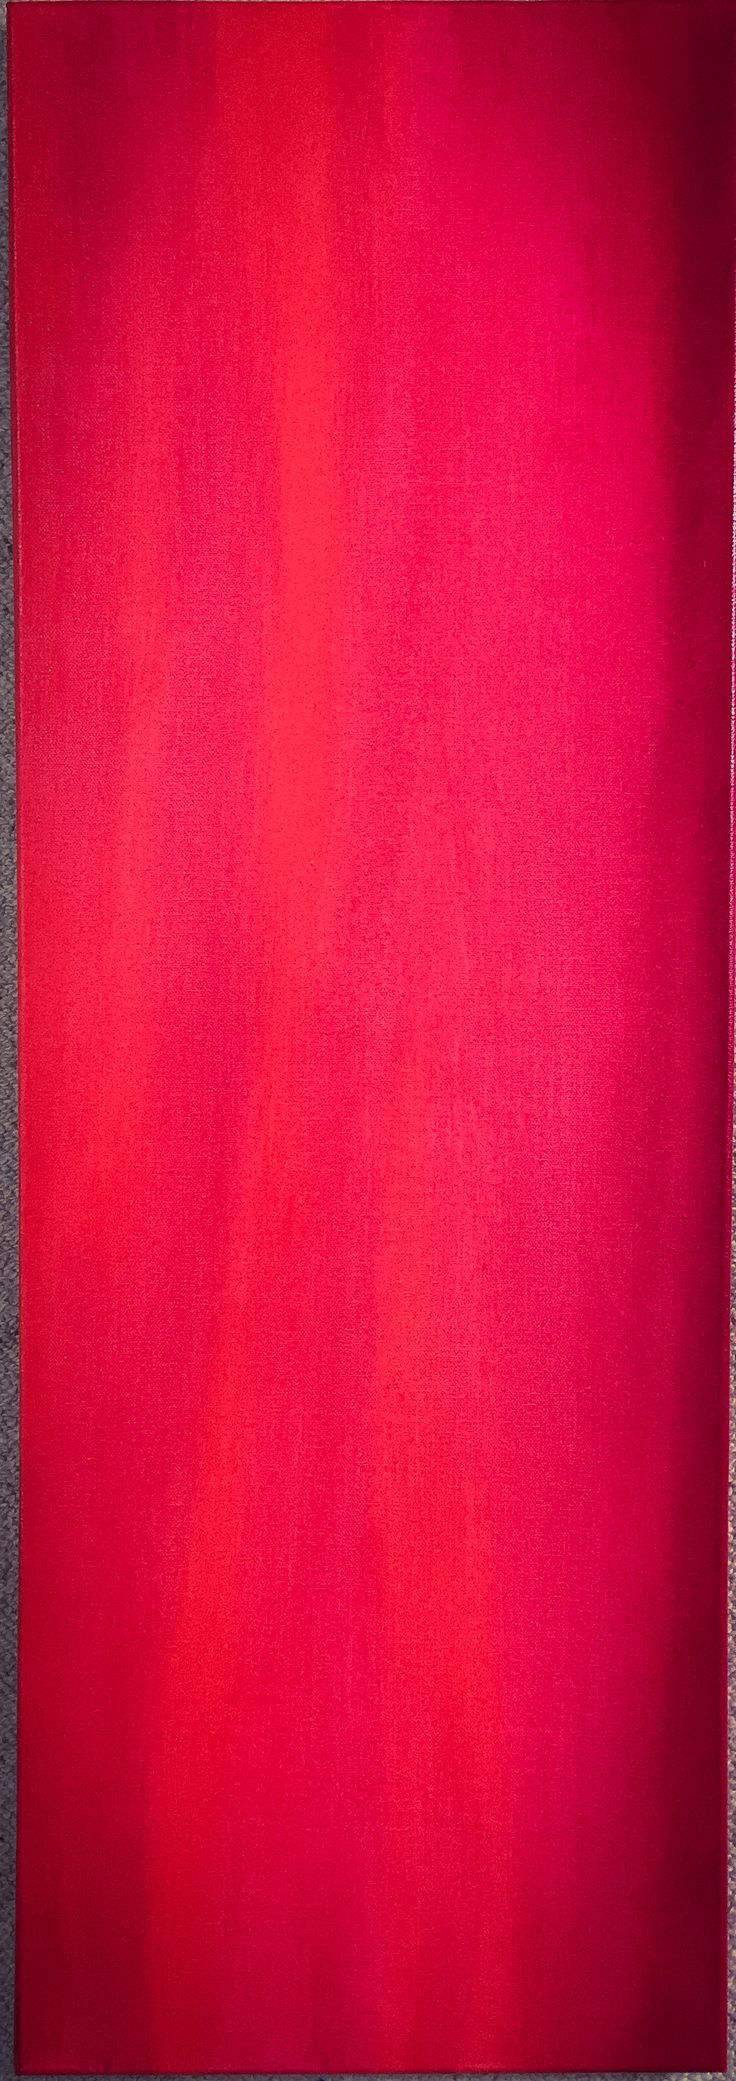 Vertikal colorfield